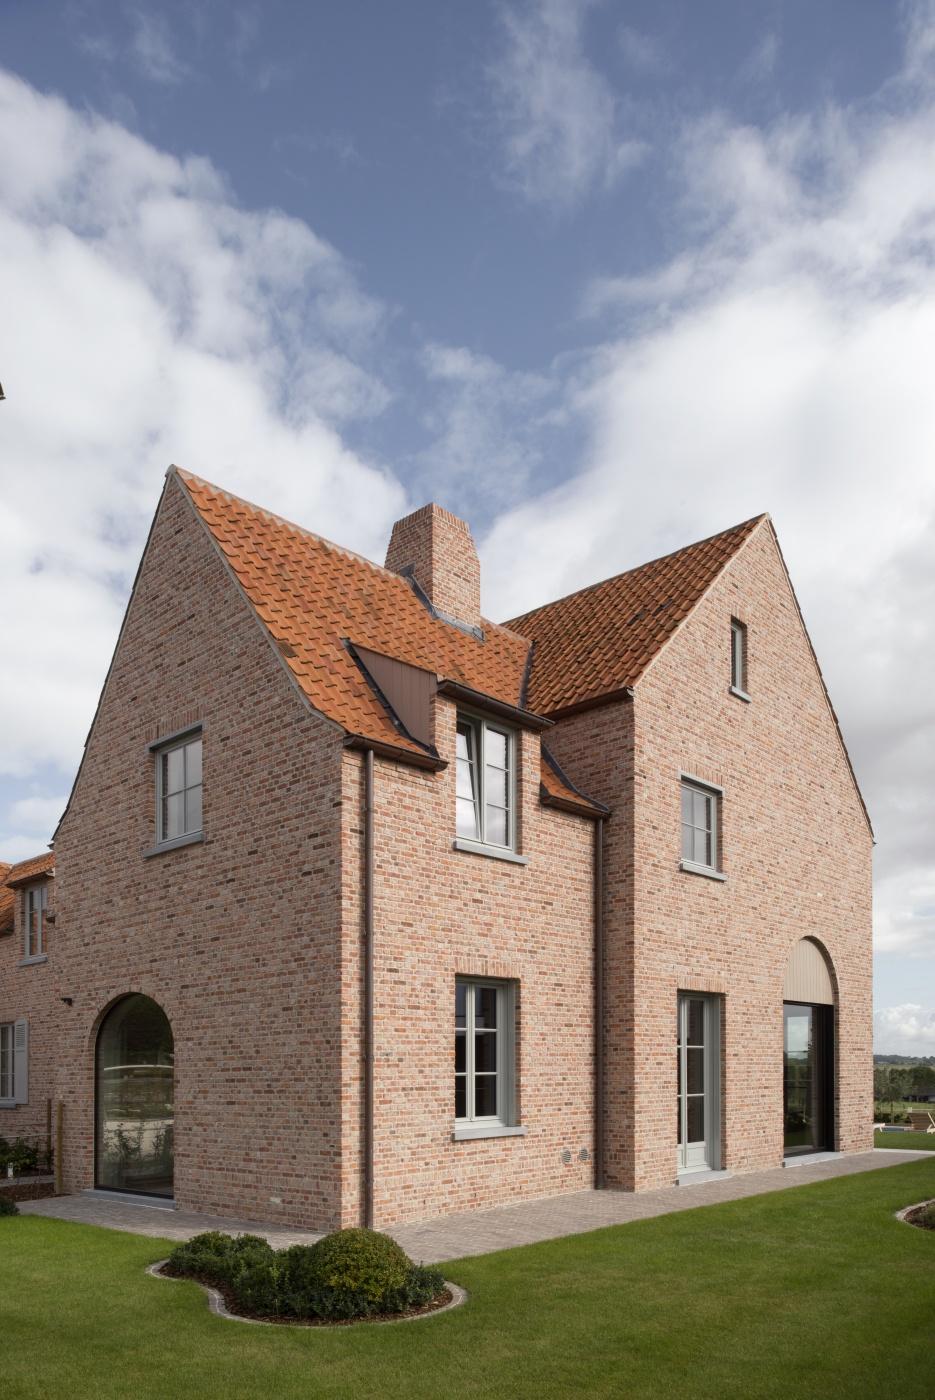 Awesome ook bouwen in deze stijl with landelijk wonen for Architect landelijk